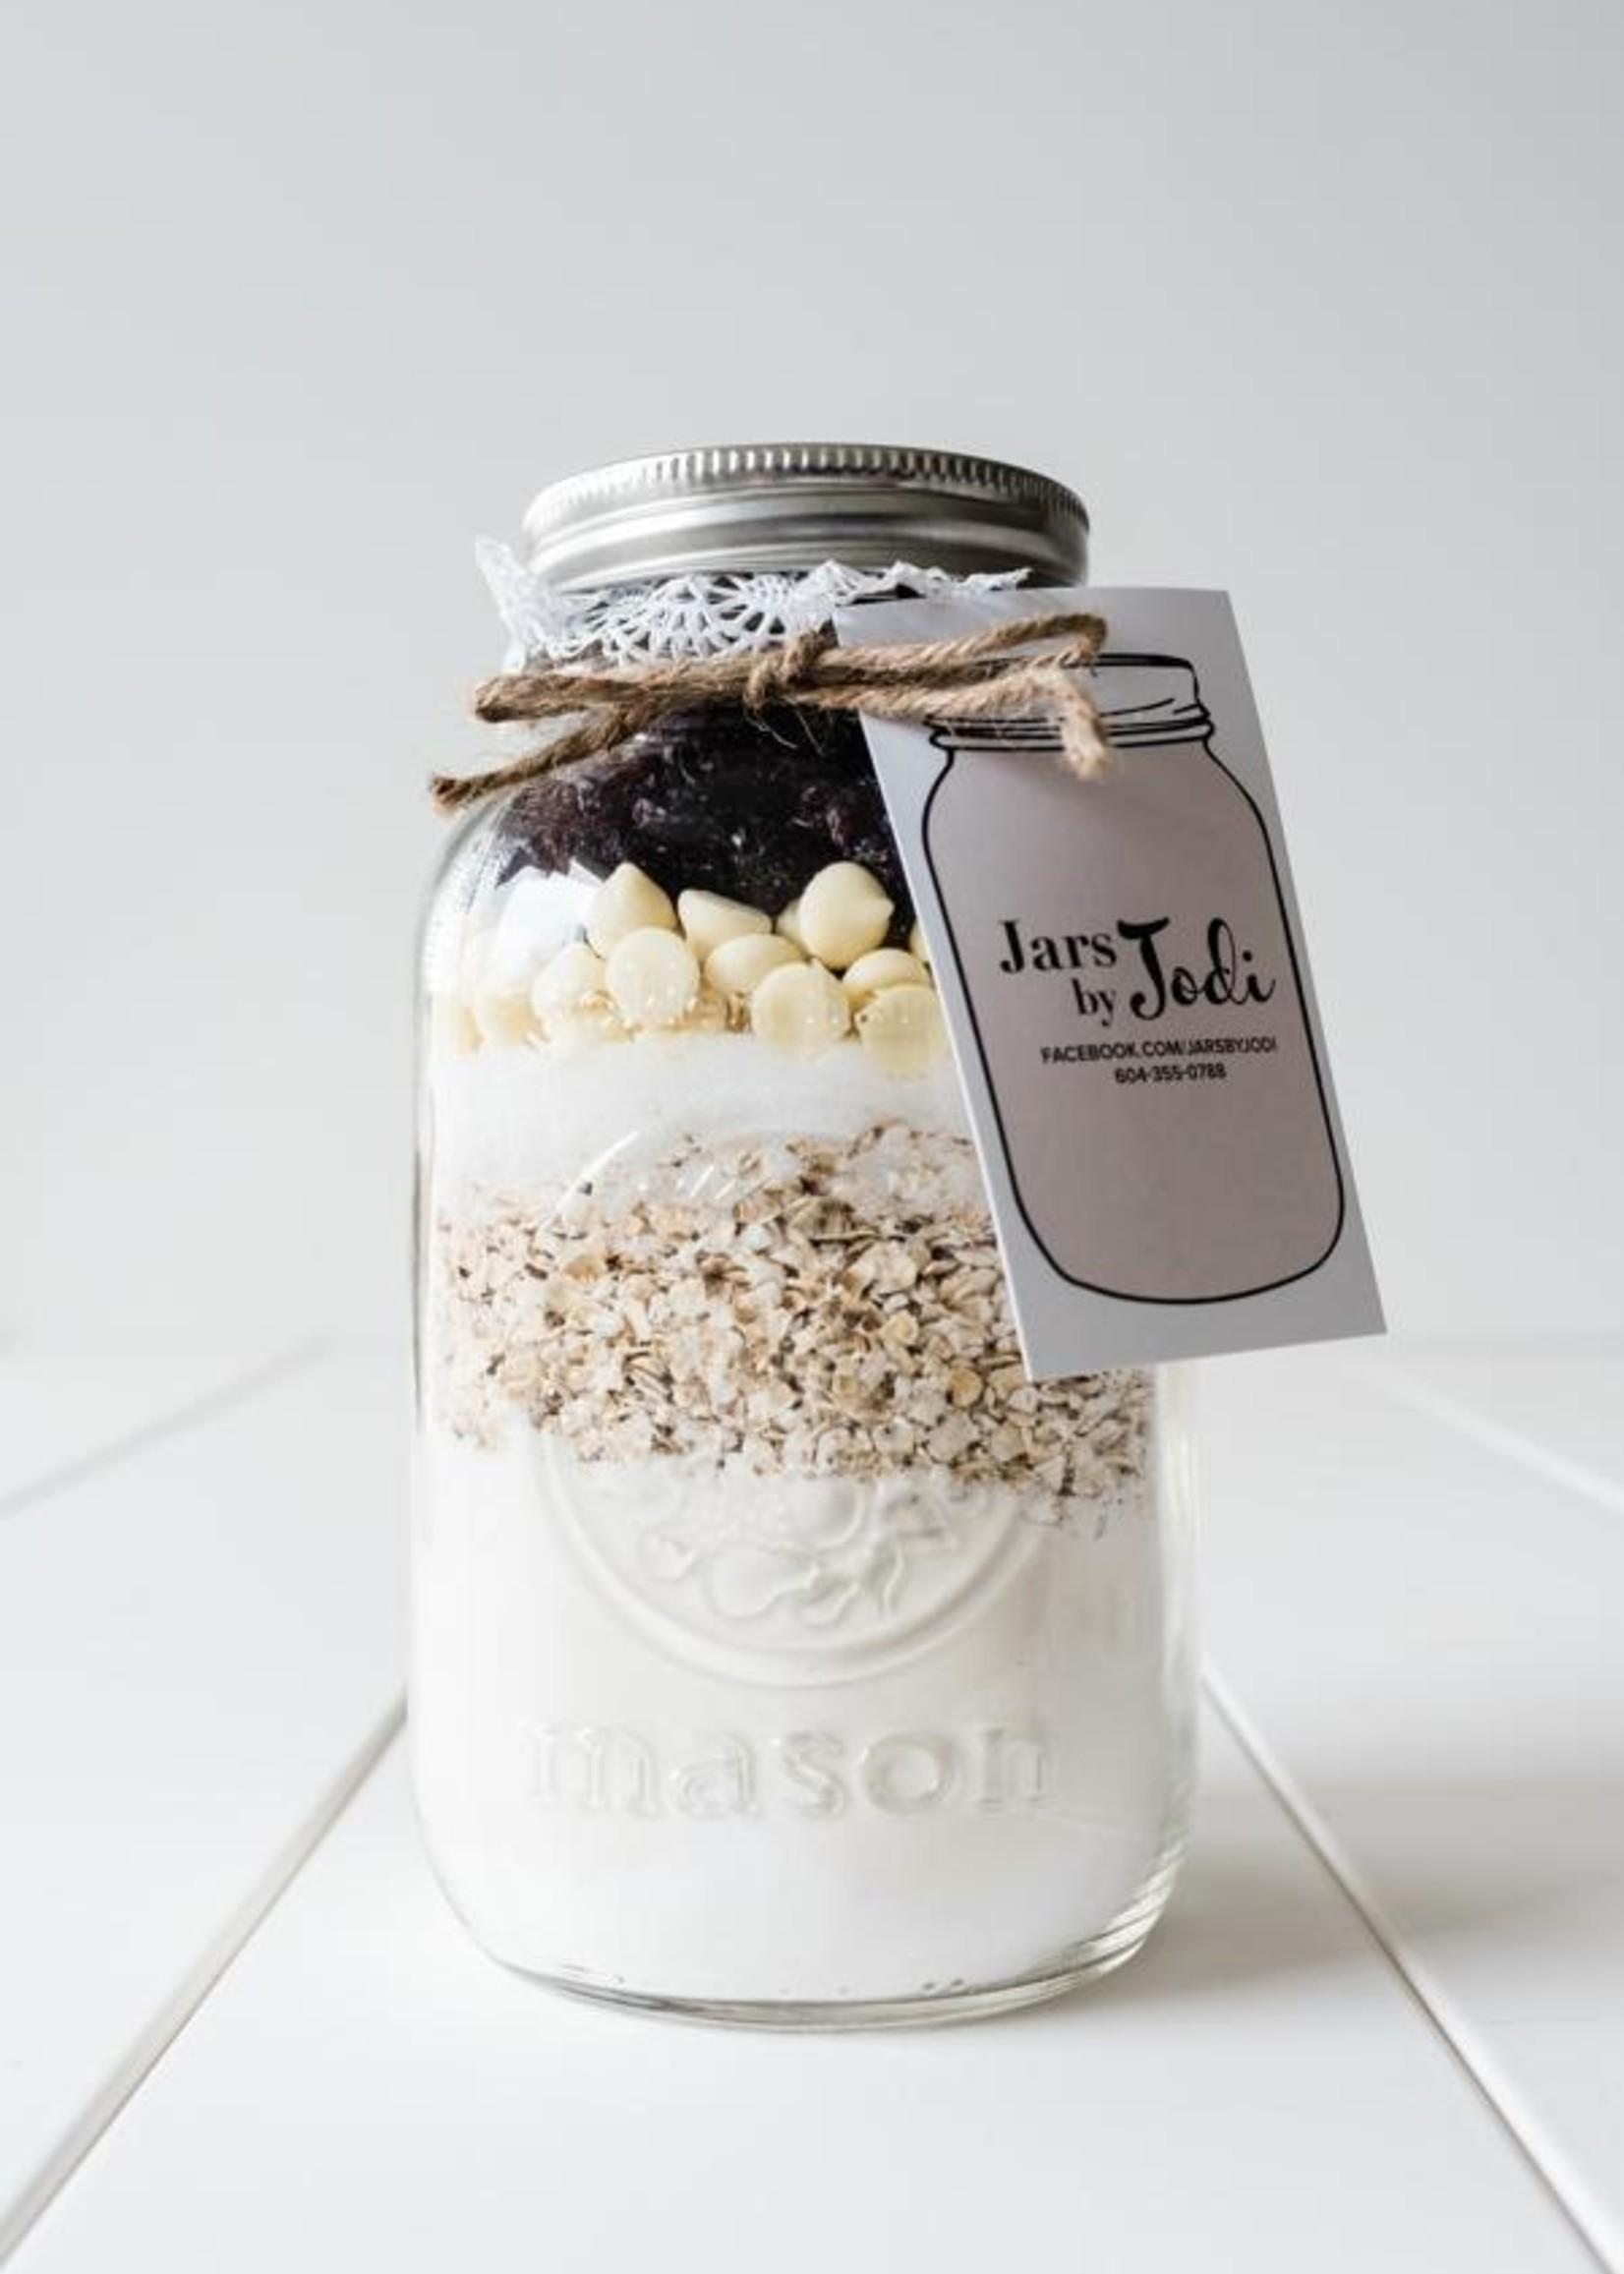 Jars By Jodi Cranberry White Chocolate Scones